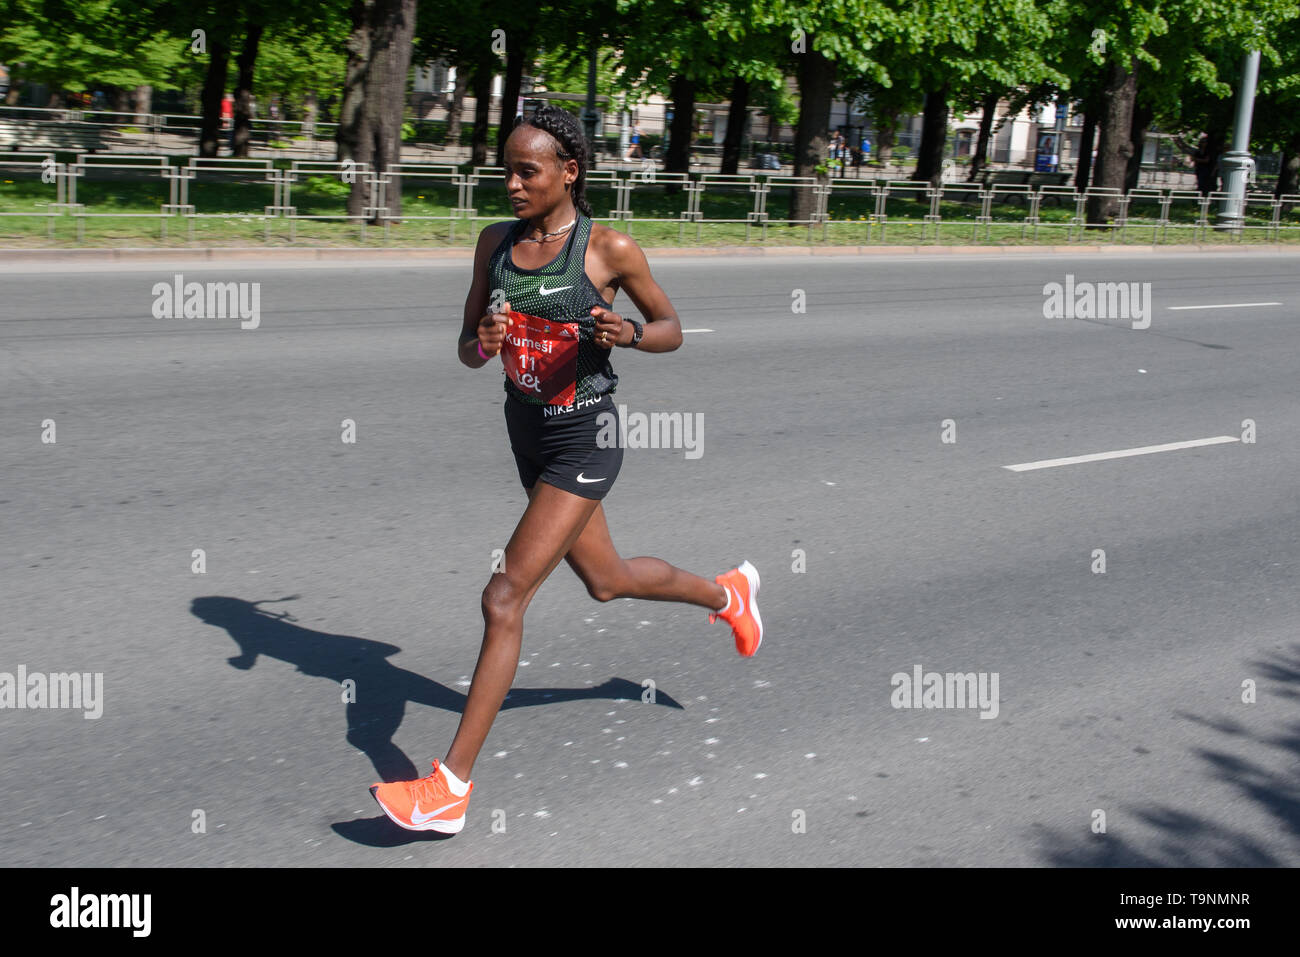 19.05.2019. RIGA, LATVIA. Kumeshi Sichala Deressa, during  TET RIGA MARATHON 2019. The only IAAF Gold Label marathon in Northern Europe. - Stock Image